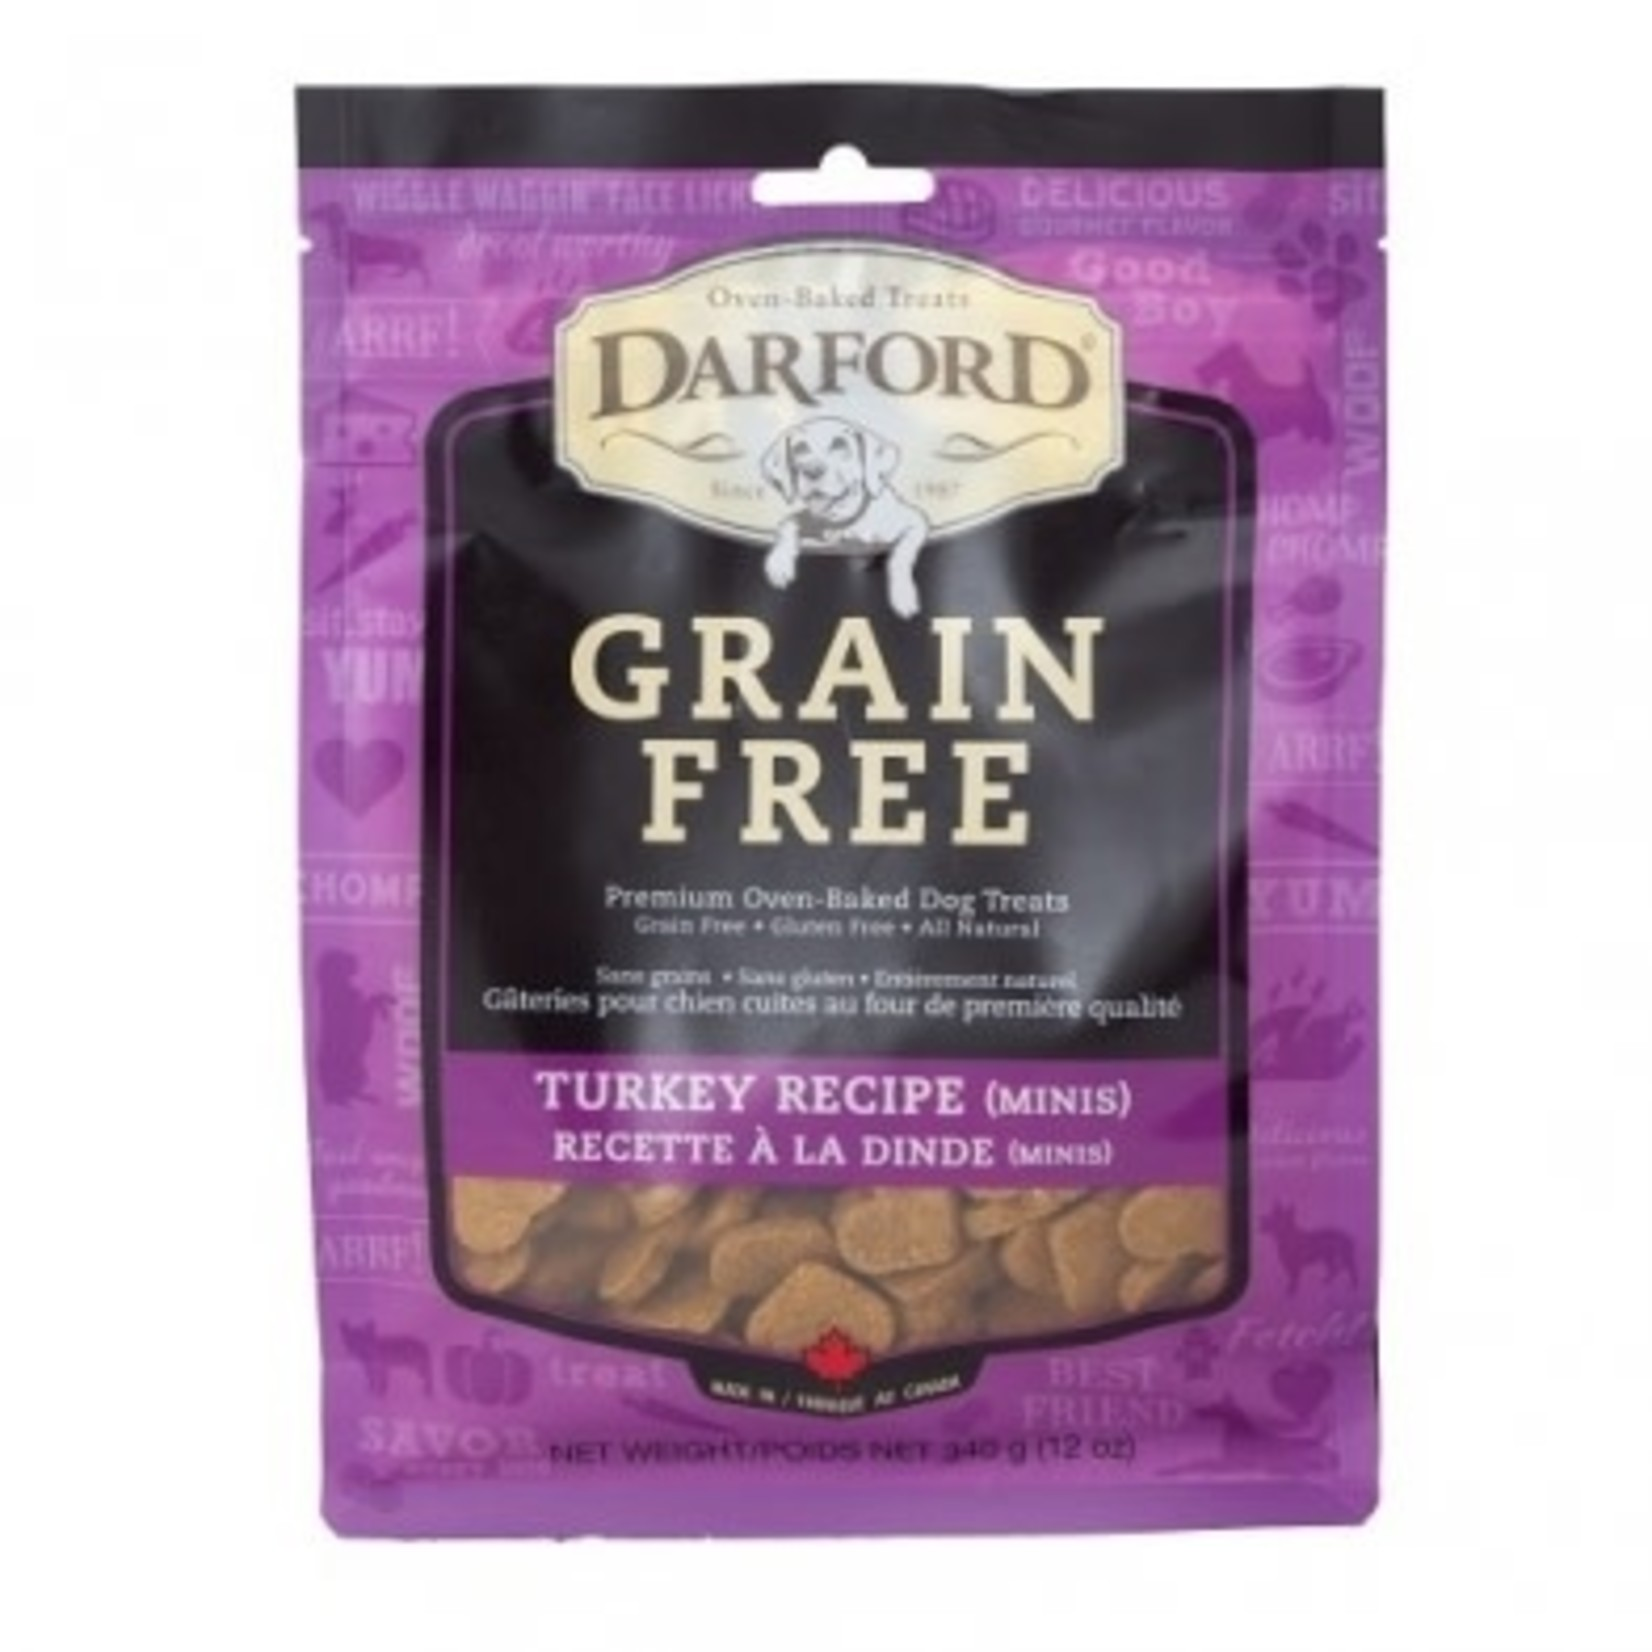 darford Darford grain free Turkey Minis 340g/12oz